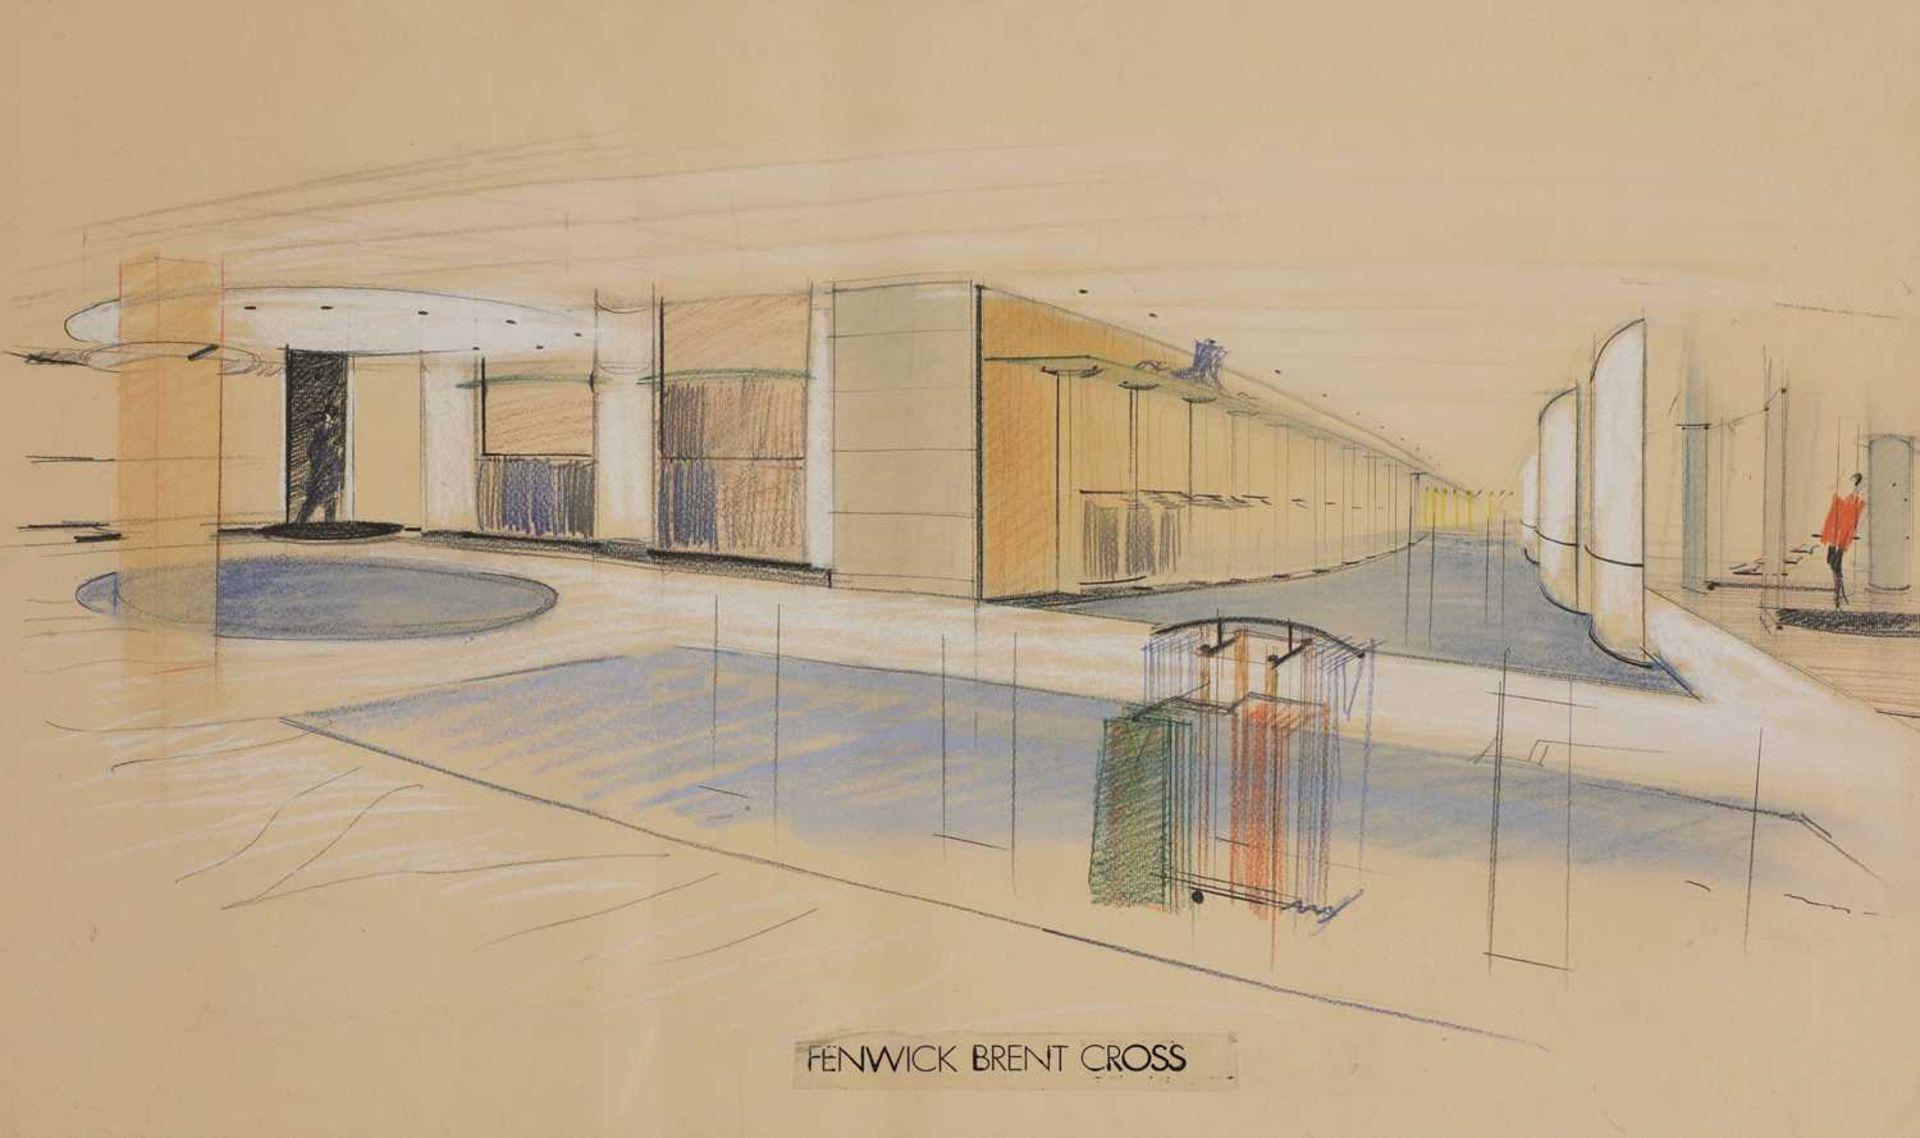 Maurice Broughton Associates, - Image 2 of 10